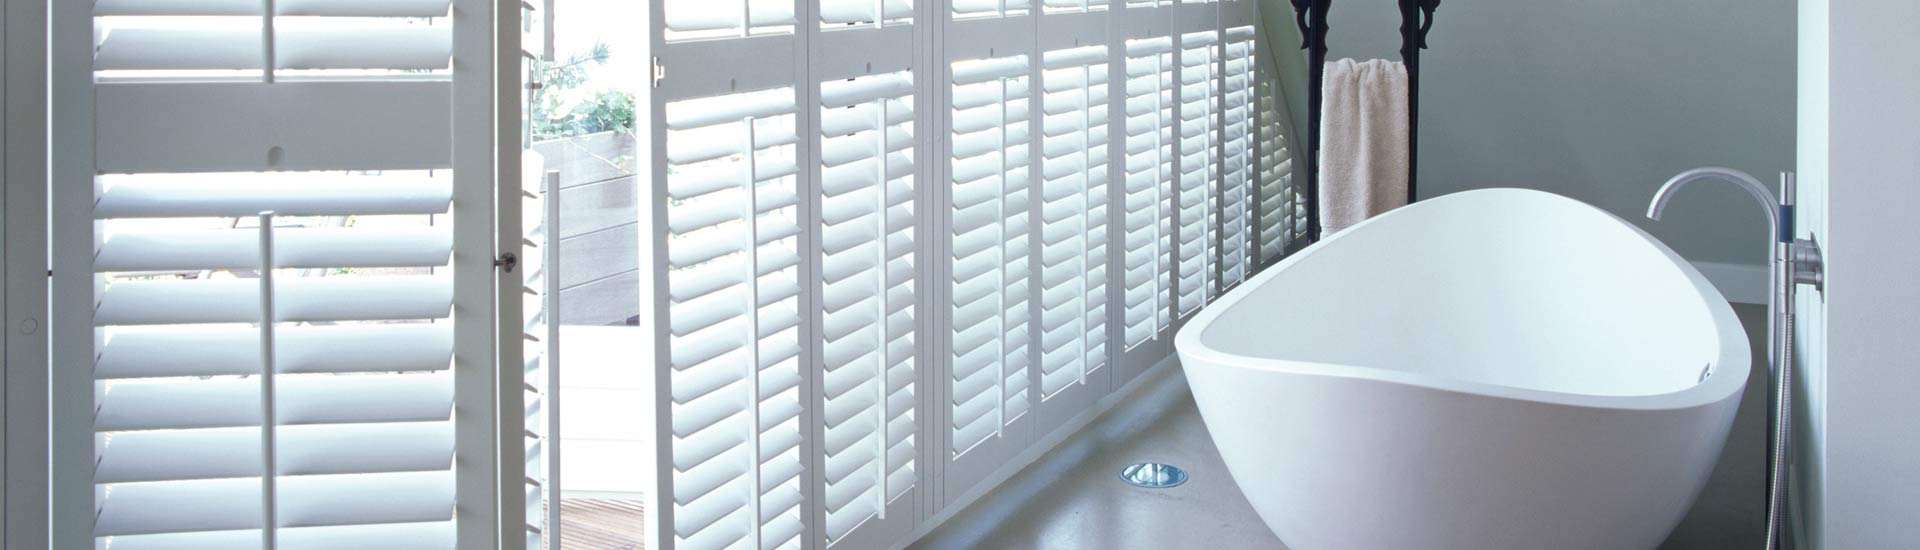 jasno shutters holzjalousien ambiente raumausstattung. Black Bedroom Furniture Sets. Home Design Ideas